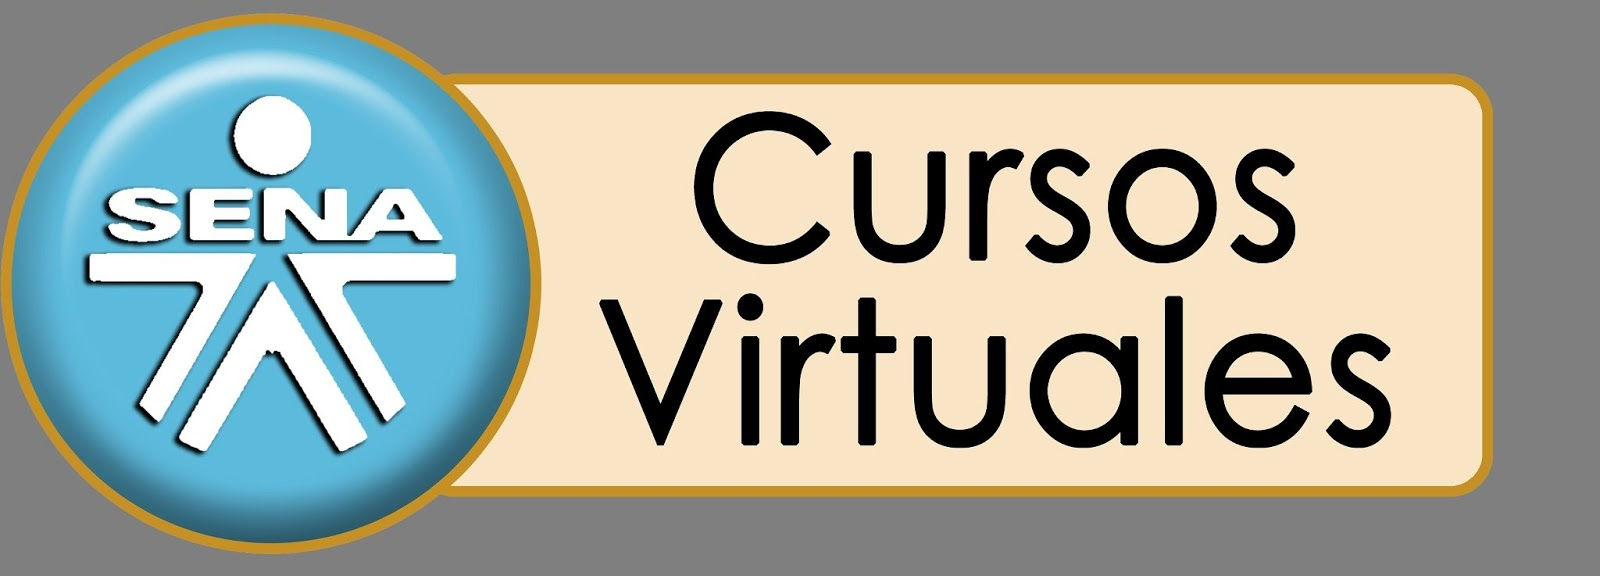 https://senasofiapluscursos.info/wp-content/uploads/2017/08/cursos-gratuitos-del-sena-virtual-educacion-certificada